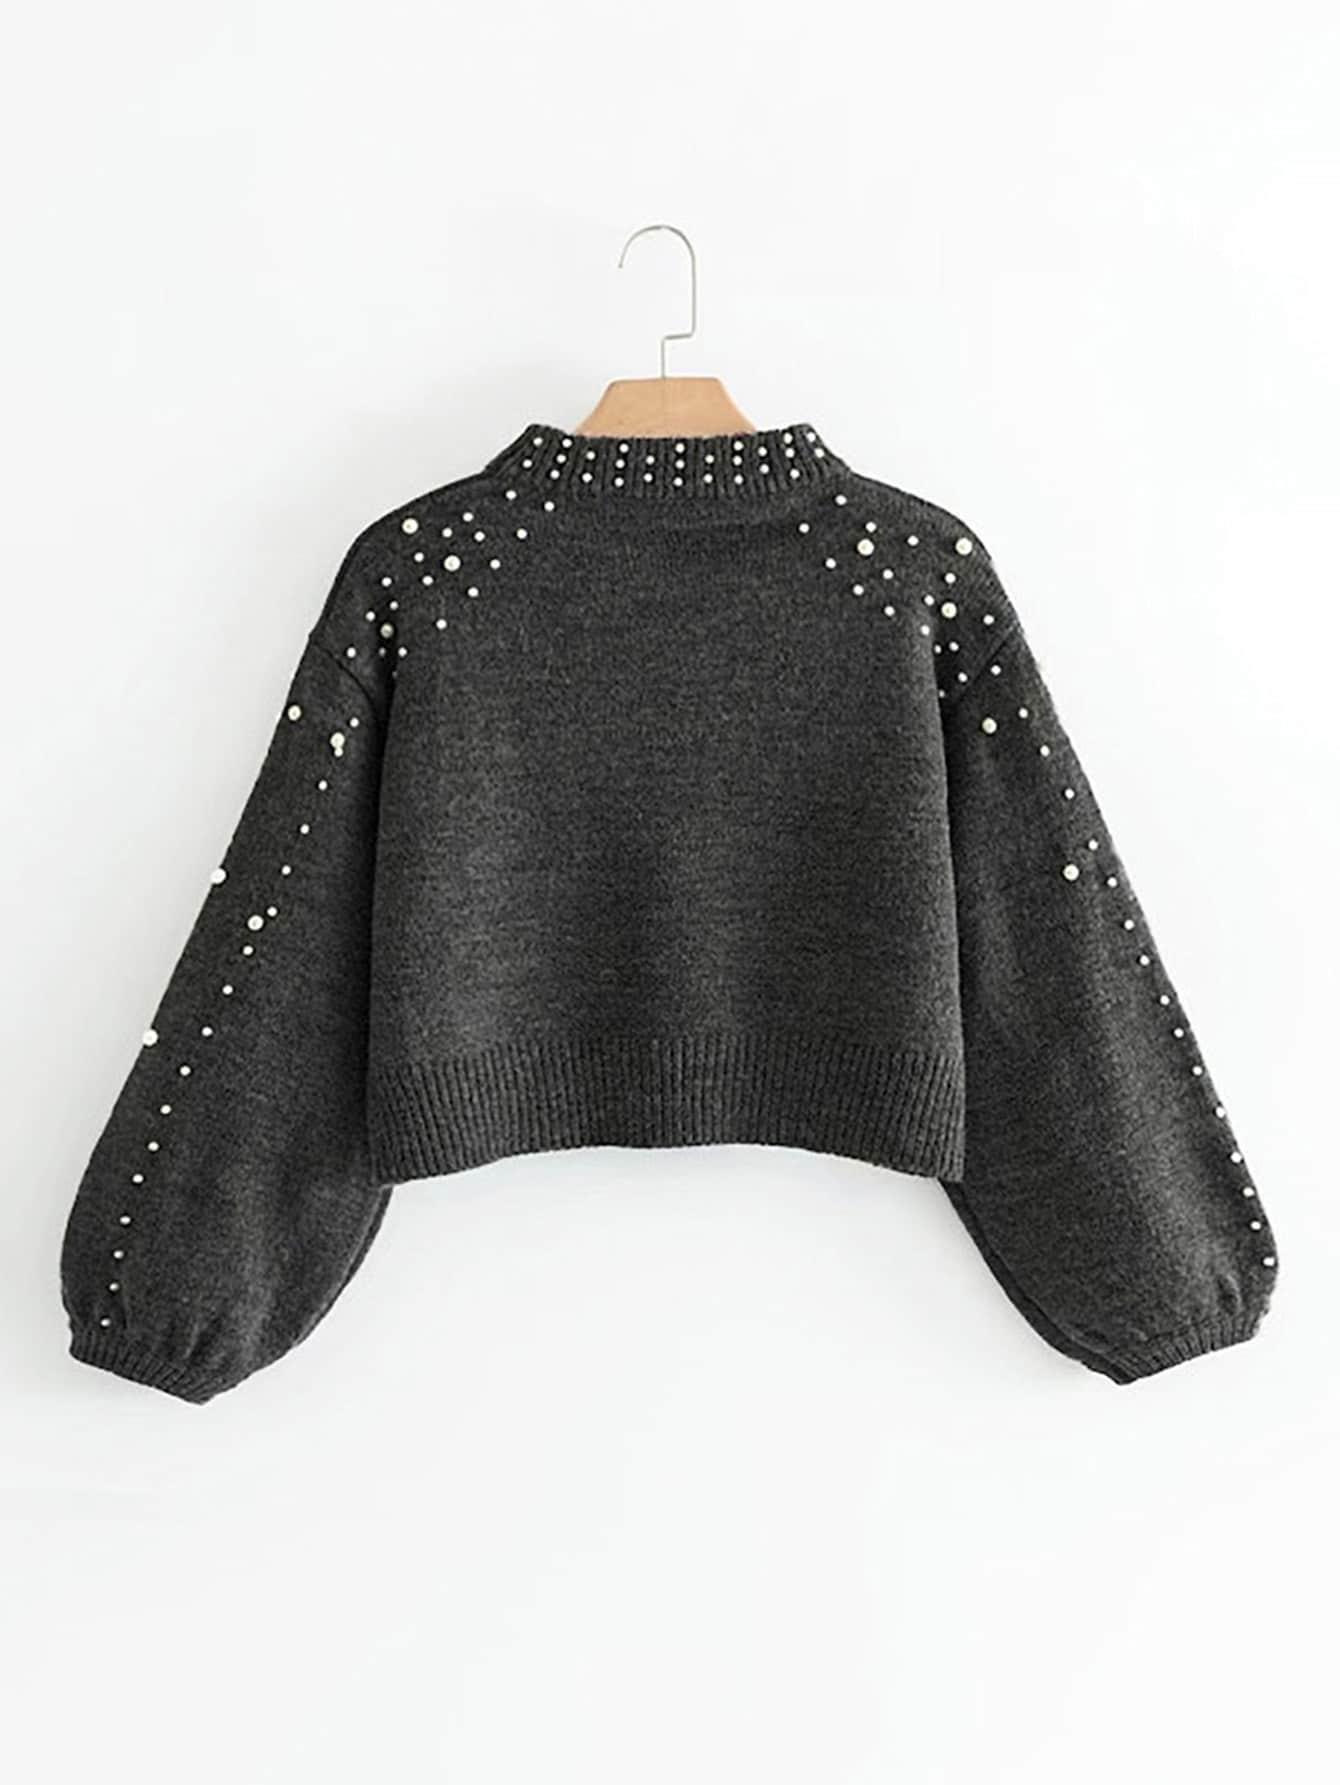 Suéter Gris de manga perla – Seven Store – Tienda de Ropa para Mujer 7c973af735a5